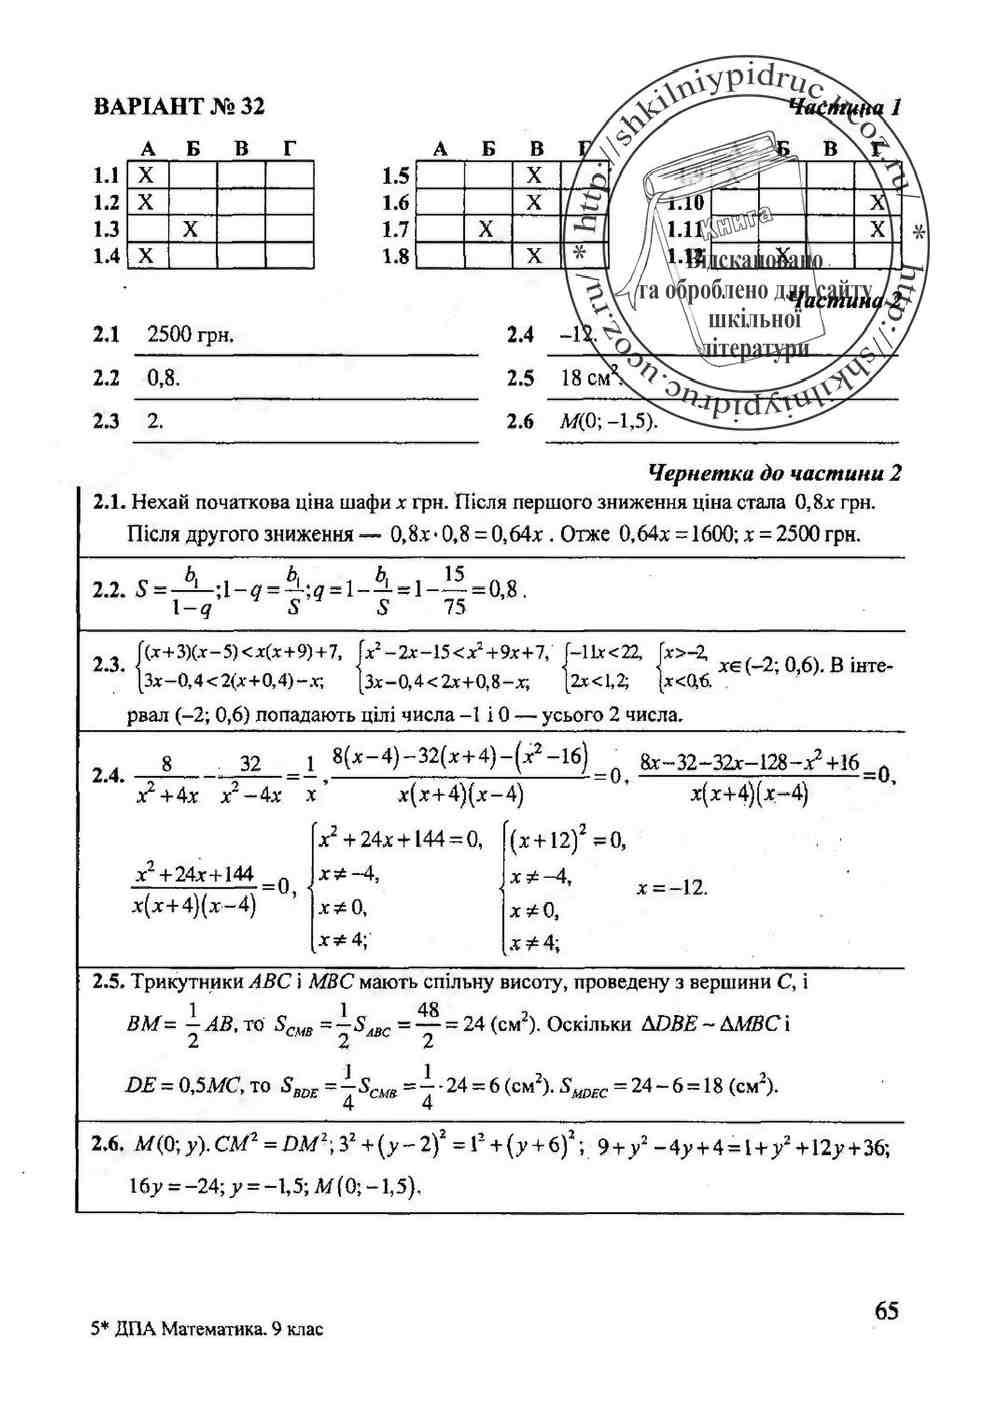 решебник для дпа по математике 9 класс 2018 глобин